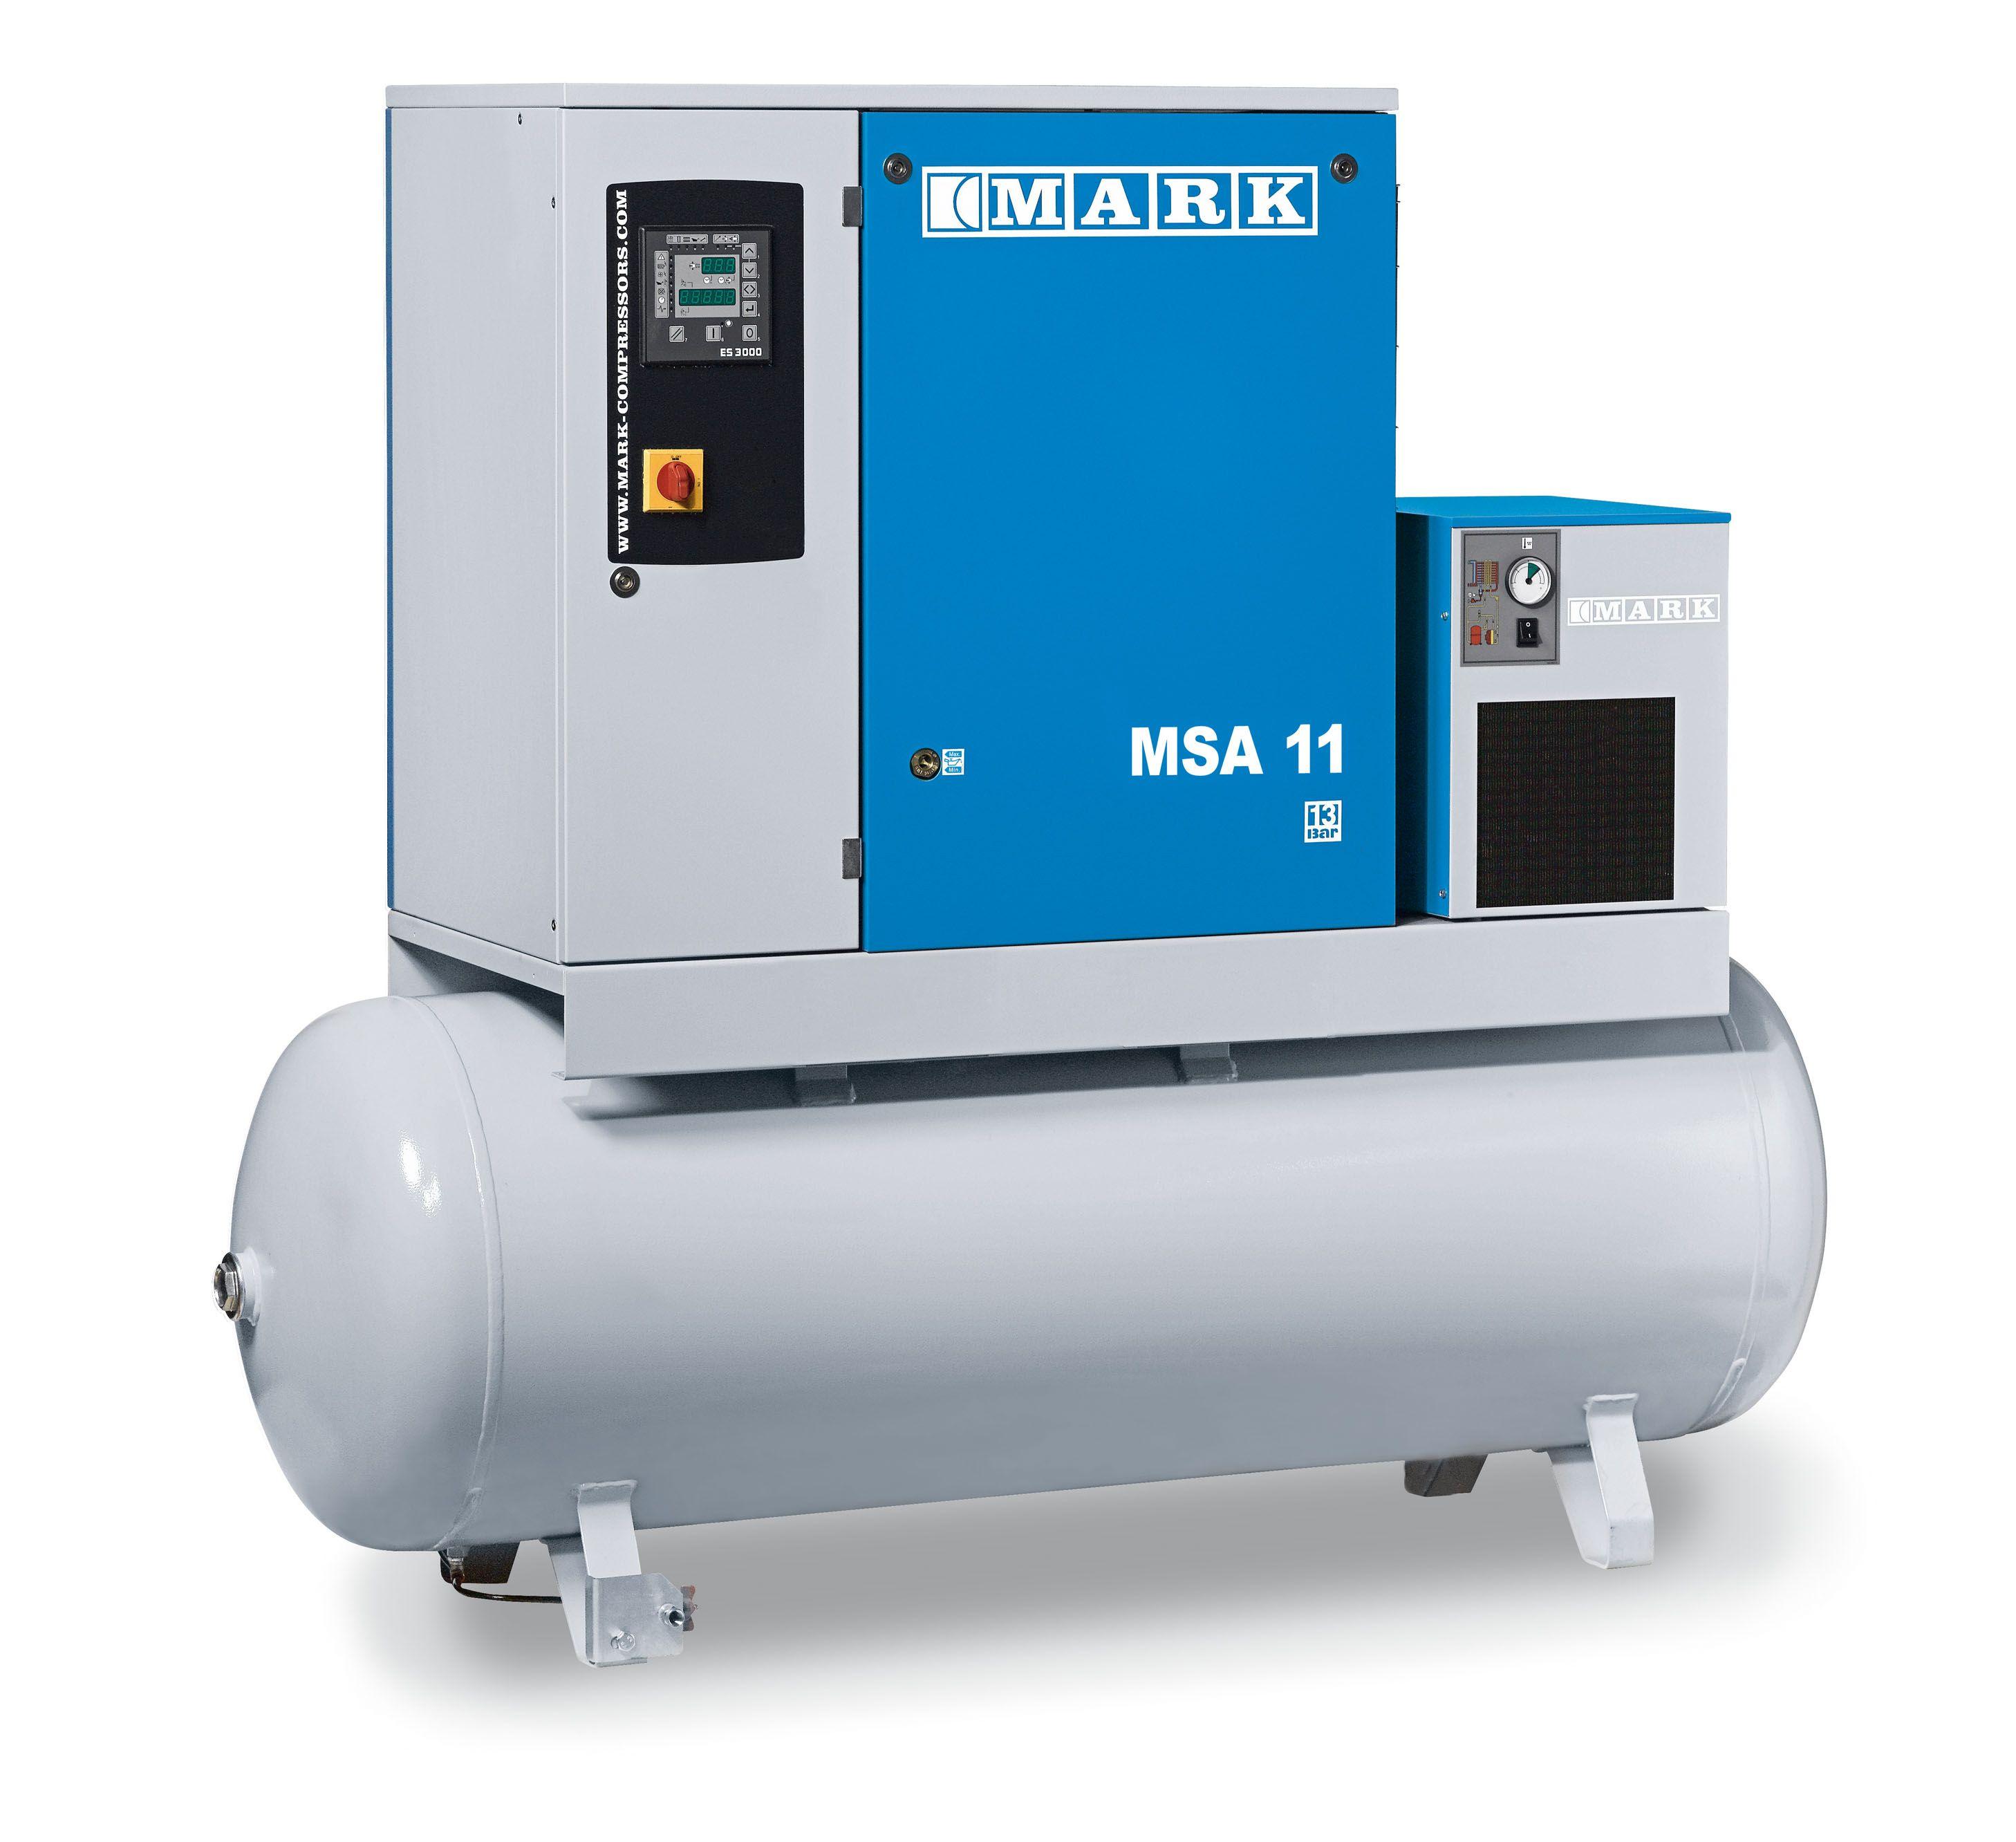 mark-msa-screw-compressor-dryer-tank